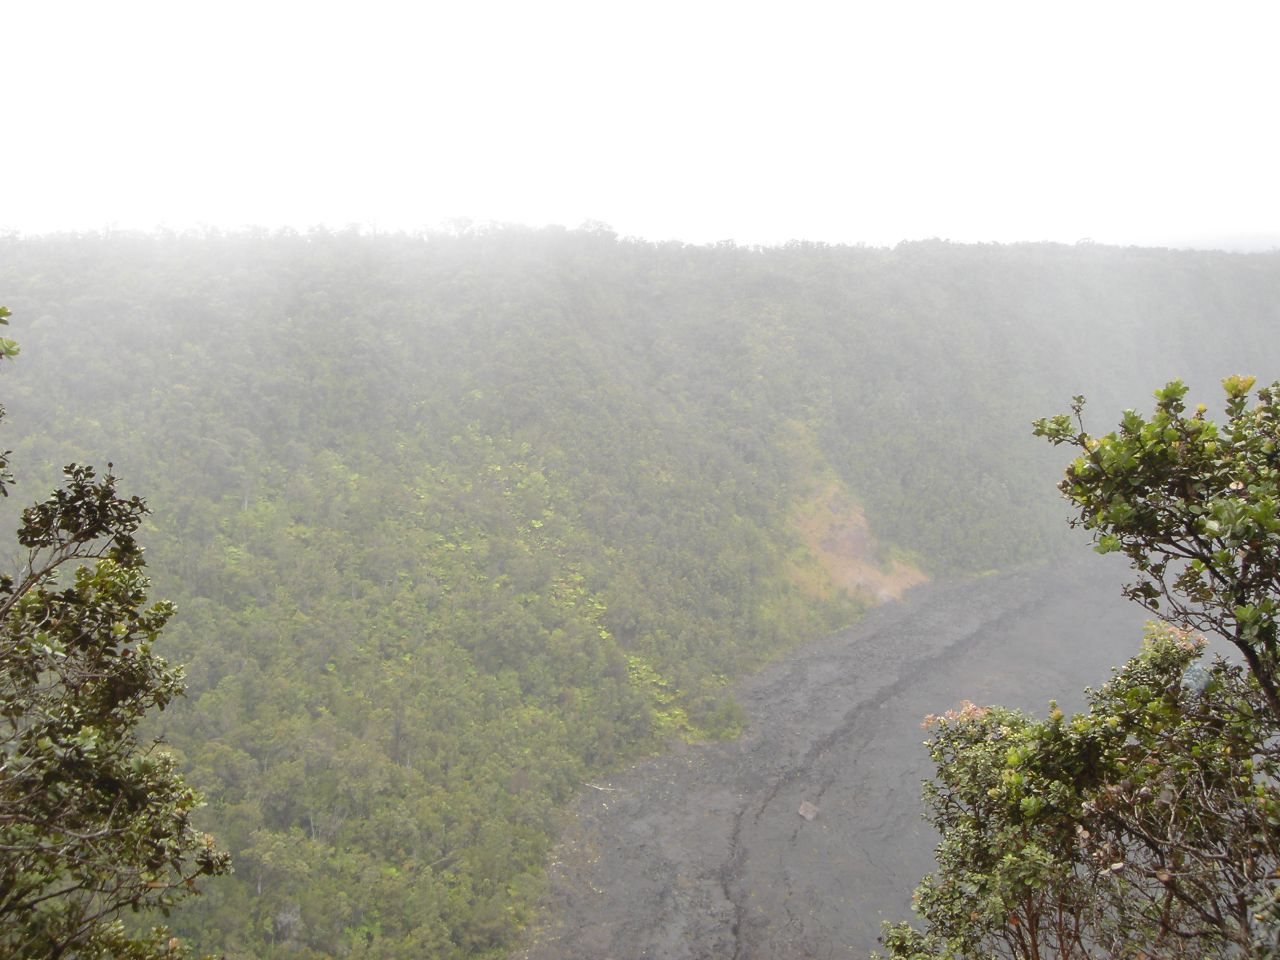 Fog over mountain in Hawaii